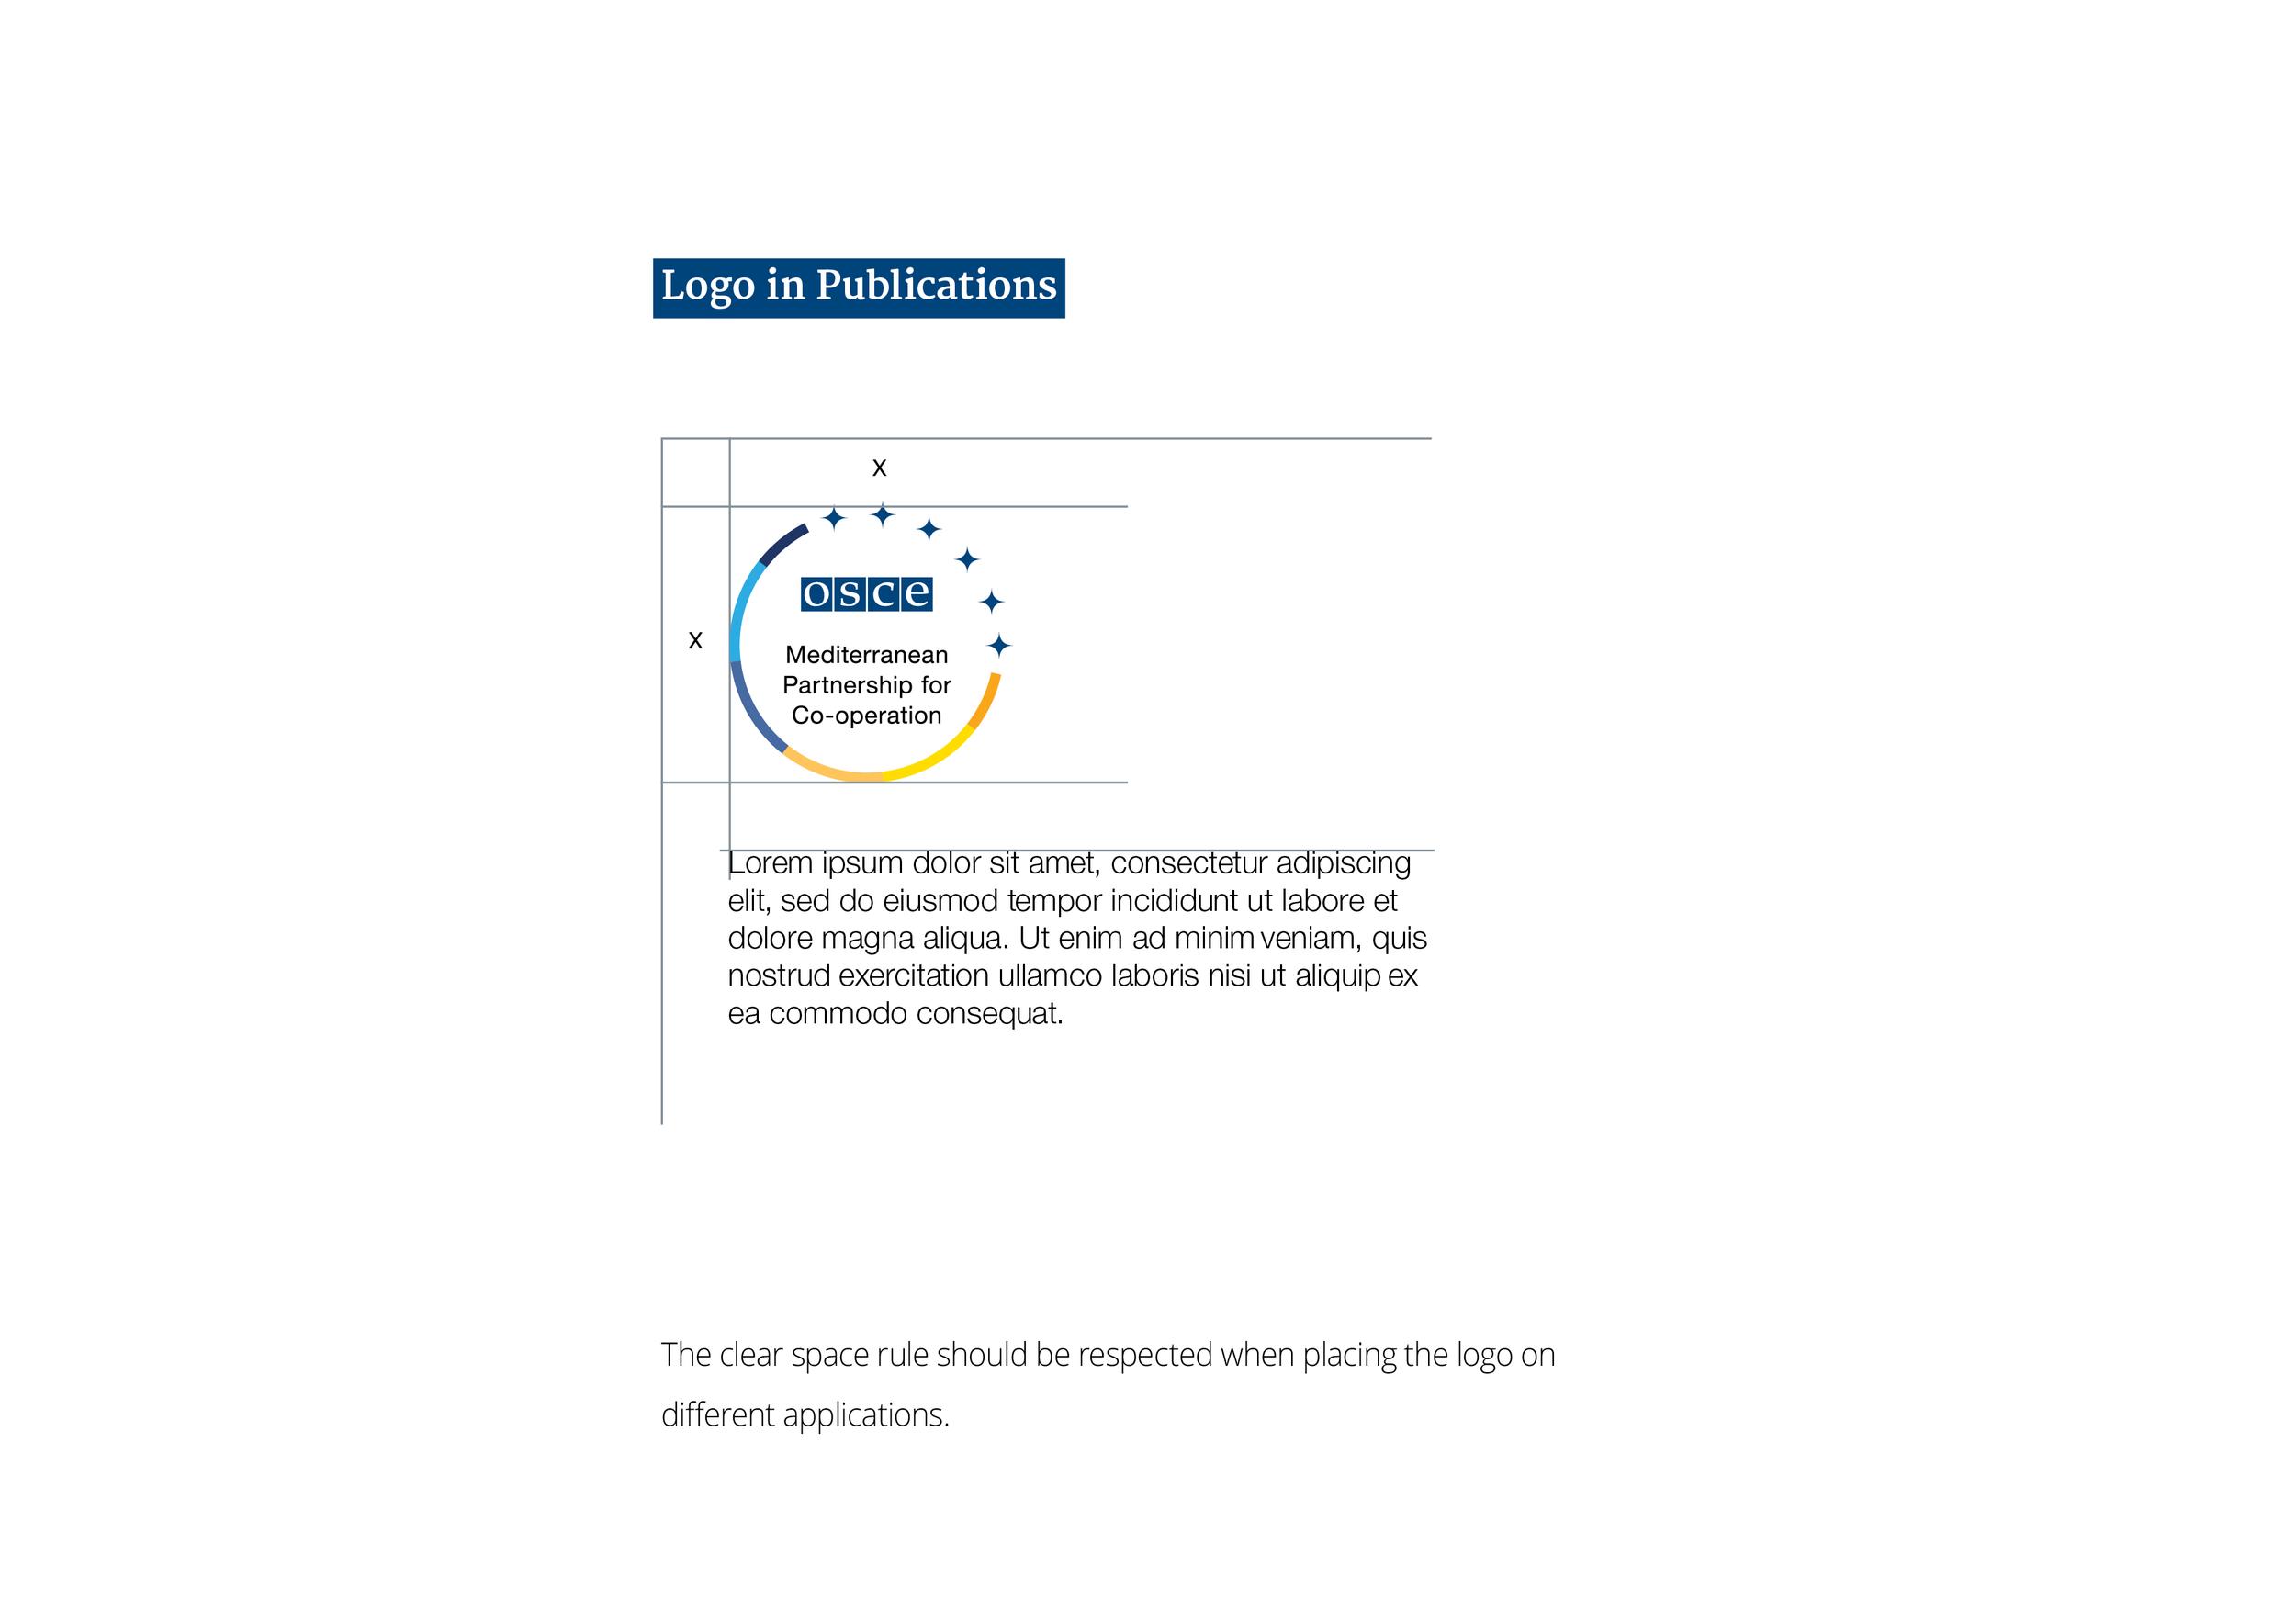 OSCE_Partnership_Logo_Graphic_Charter_31101614.png